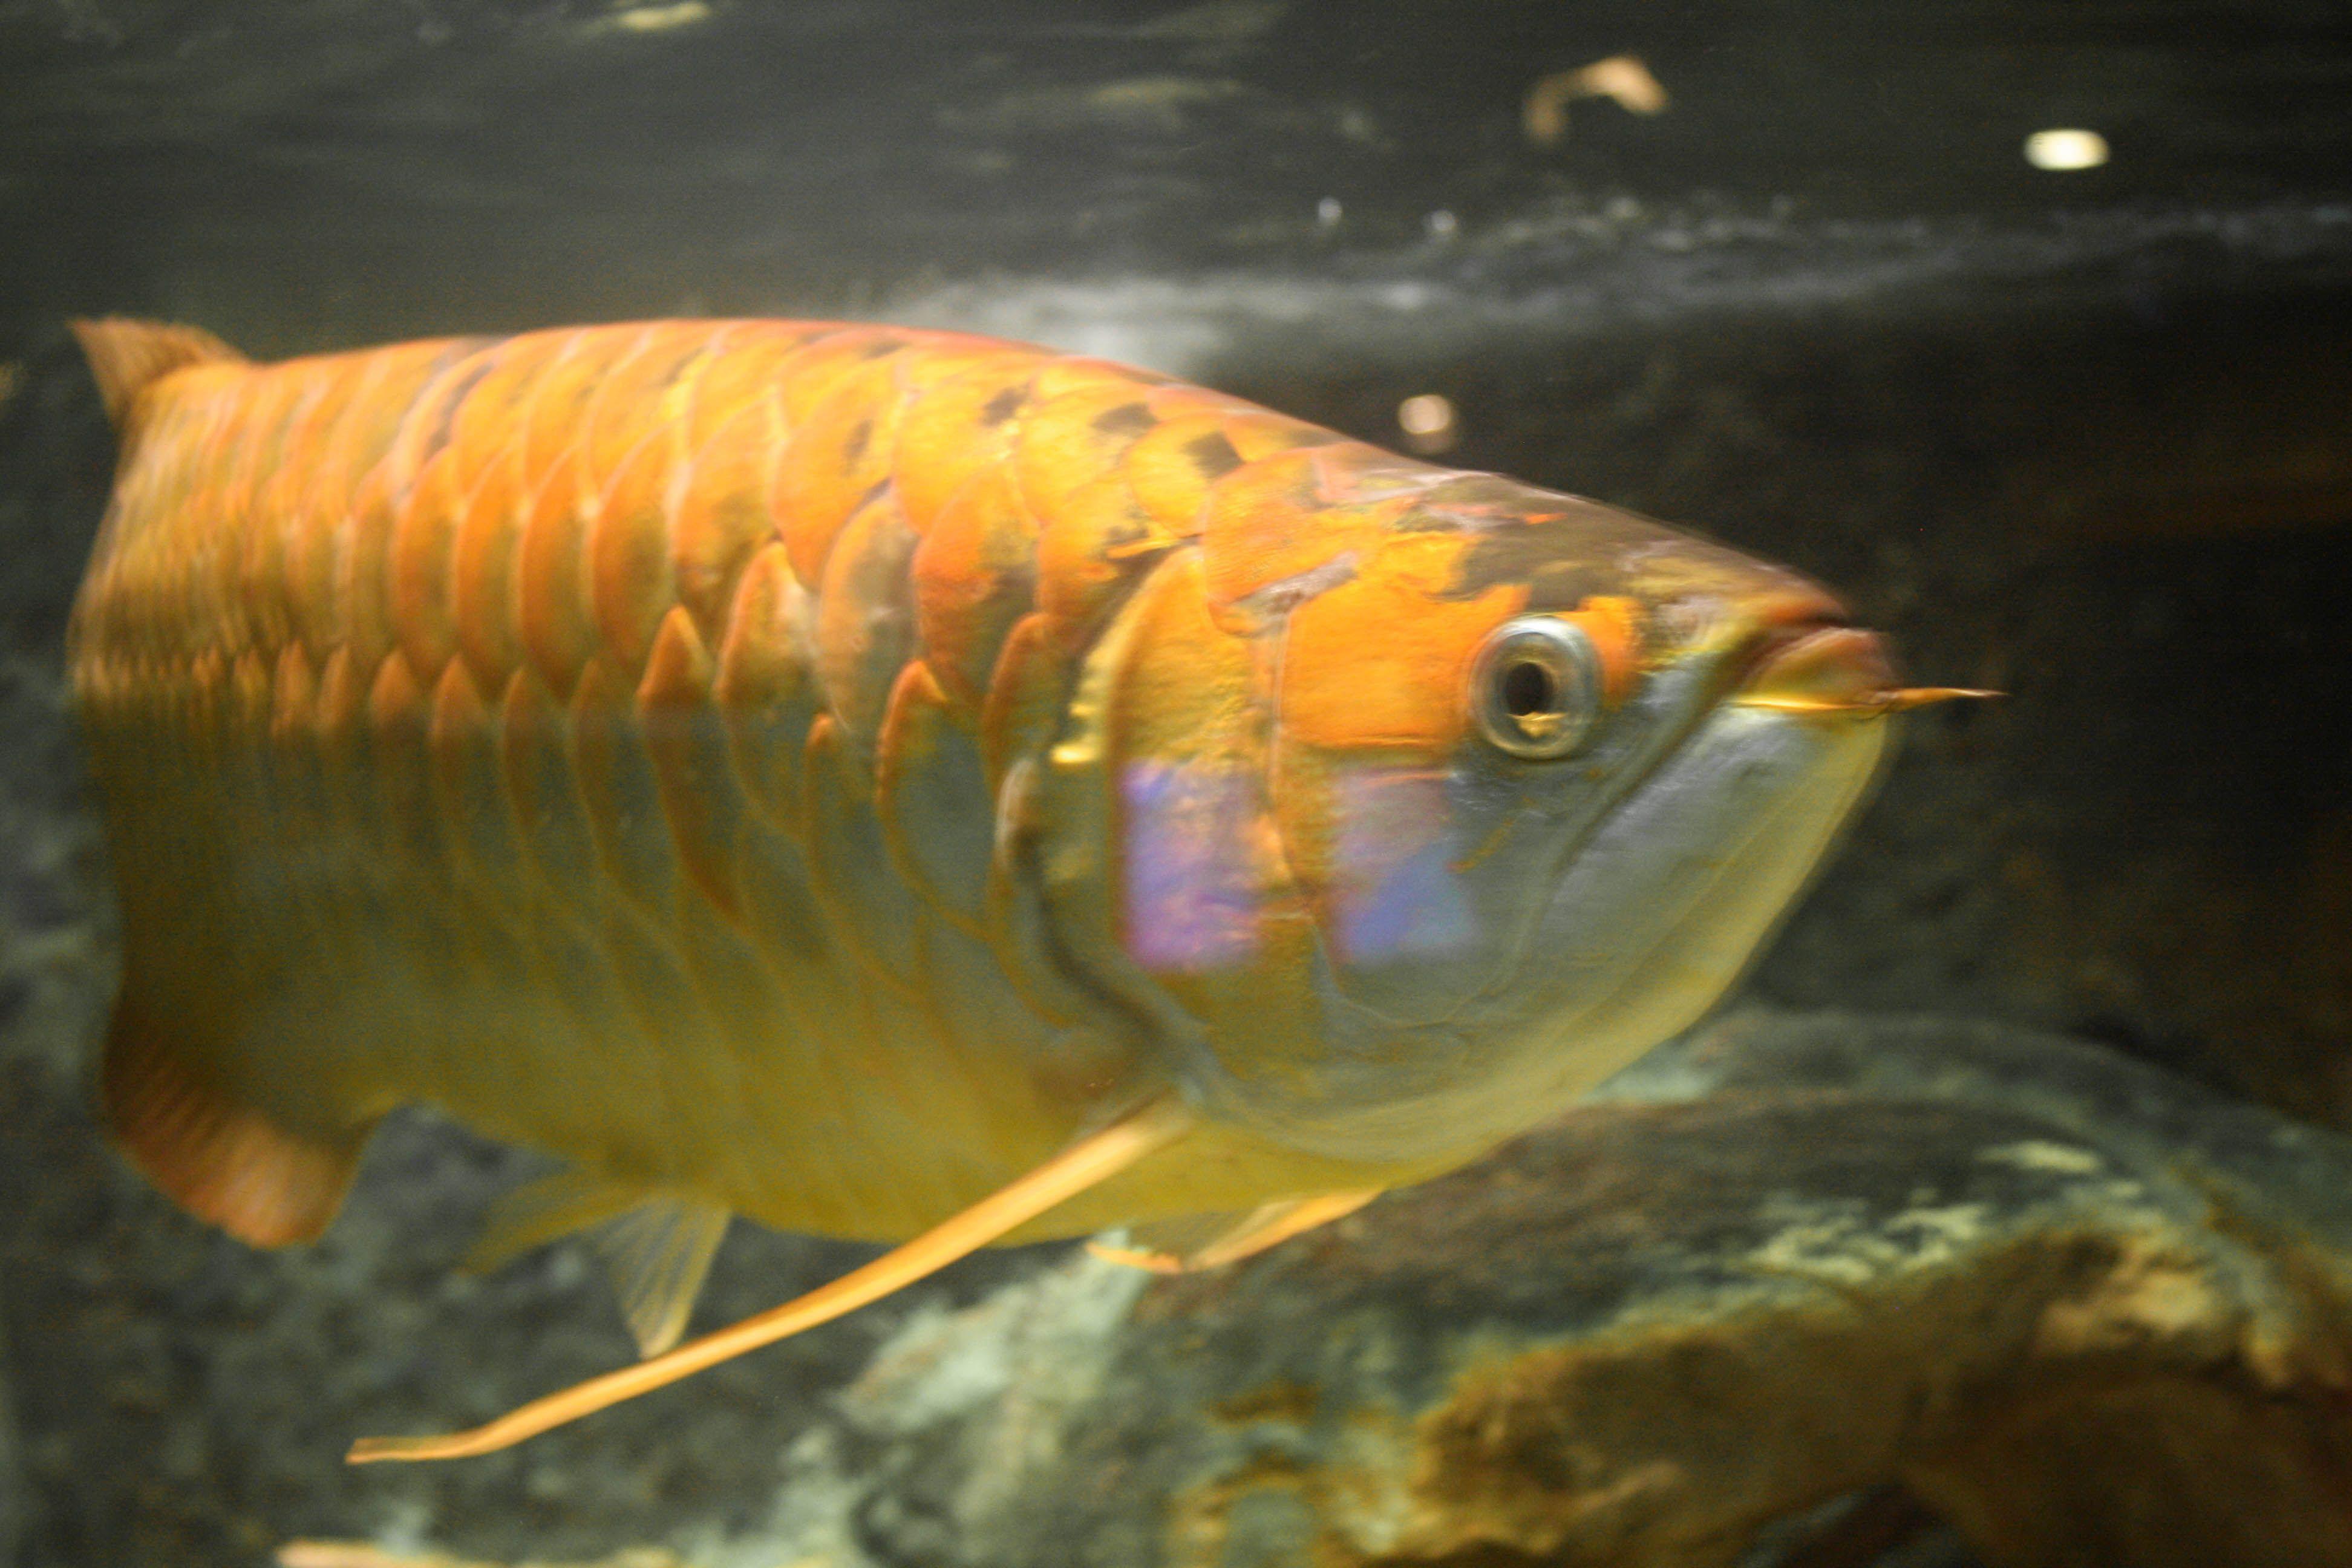 Fish aquarium in niagara falls - Aquarium Of Niagara Niagara Falls New York Www Stephentravels Com Top5